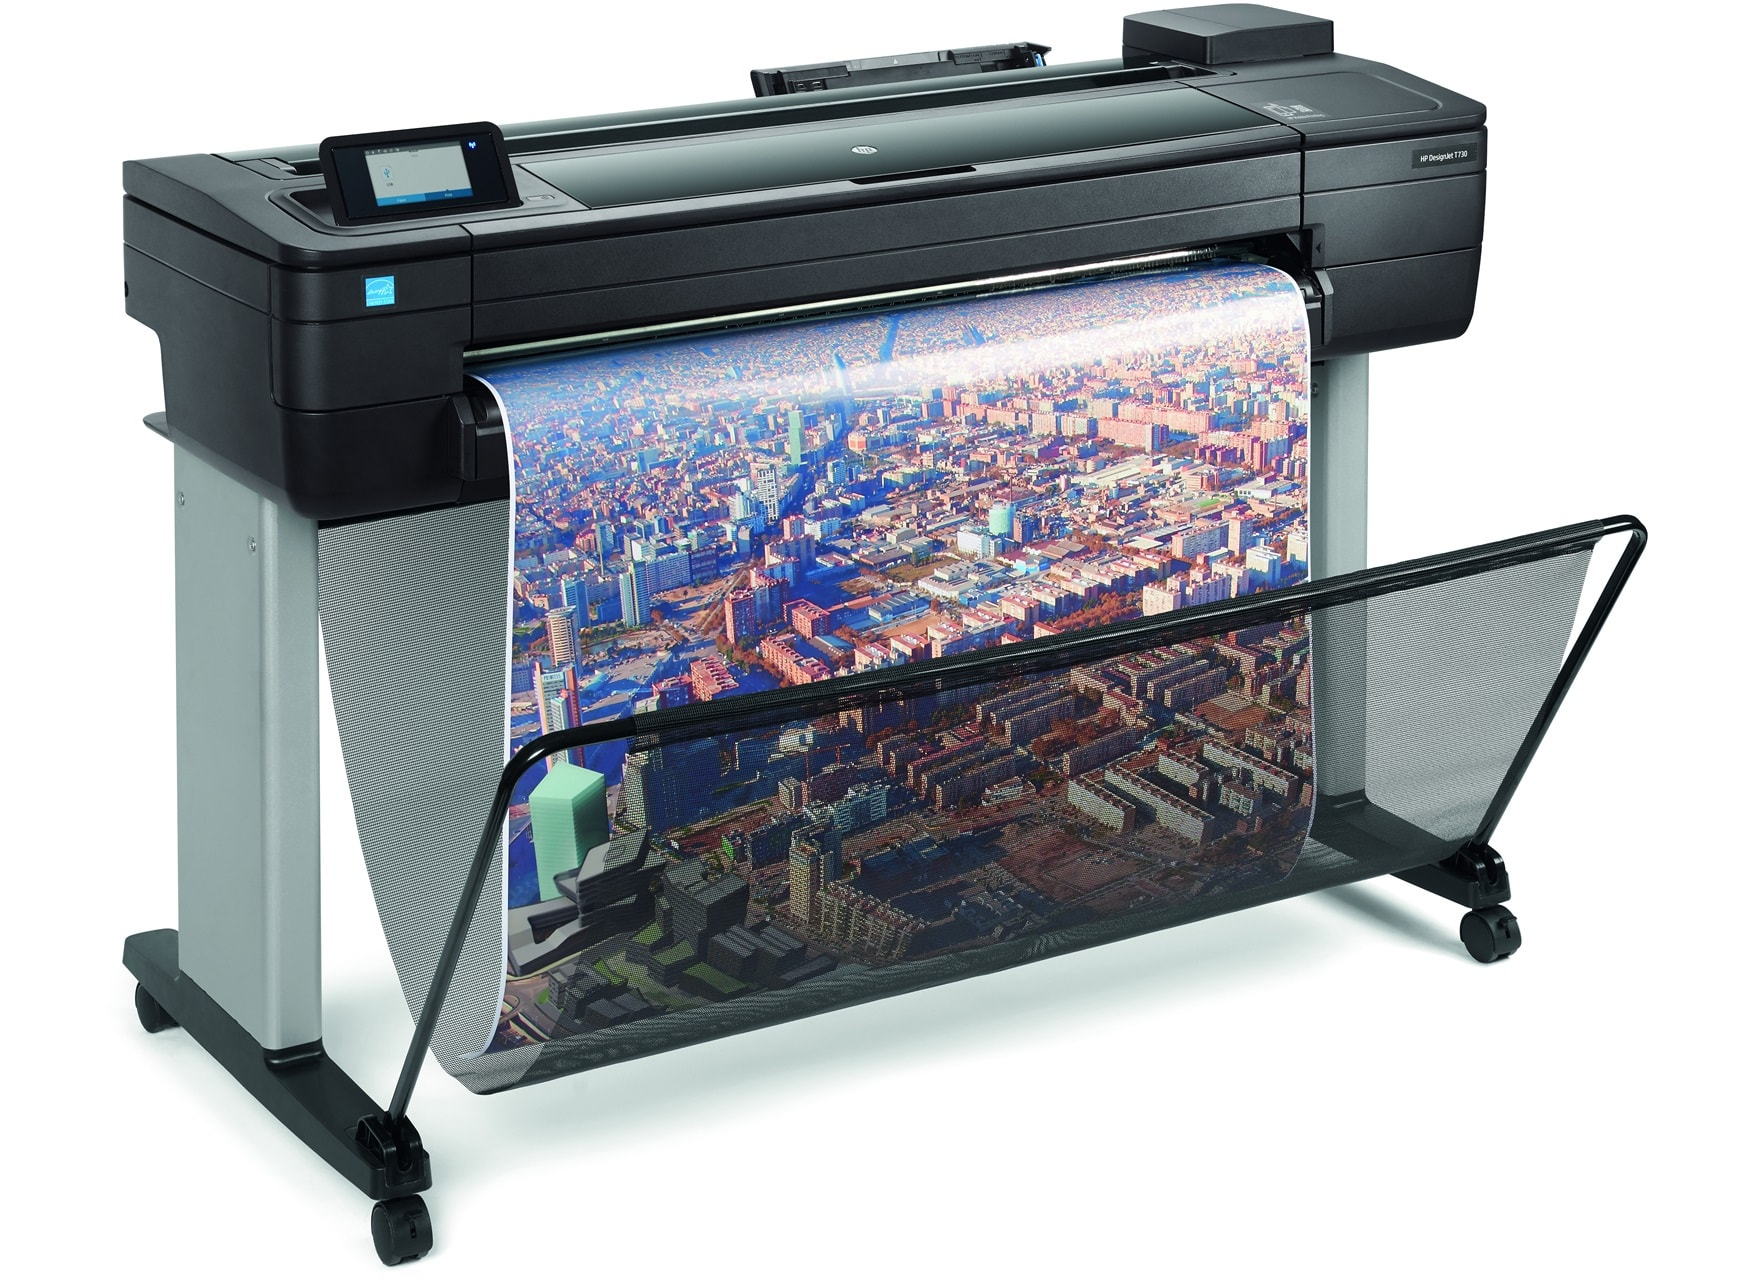 "Imprimante HP DesignJet T730 36"" - Cybertek.fr - 4"